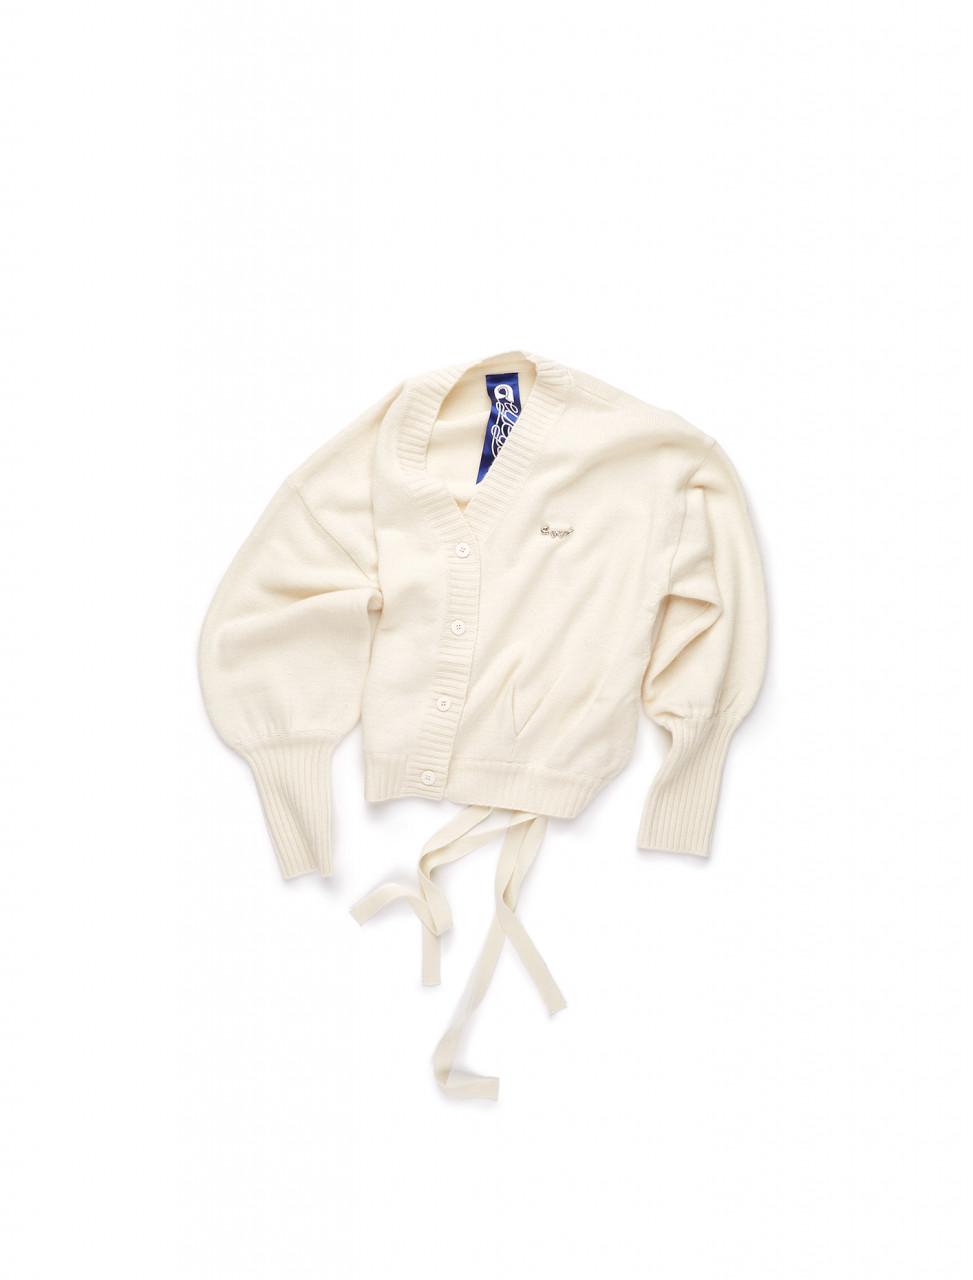 351-EETZ3CDR03W KYE CASHMERE BACK DETAIL CARDIGAN WHITE